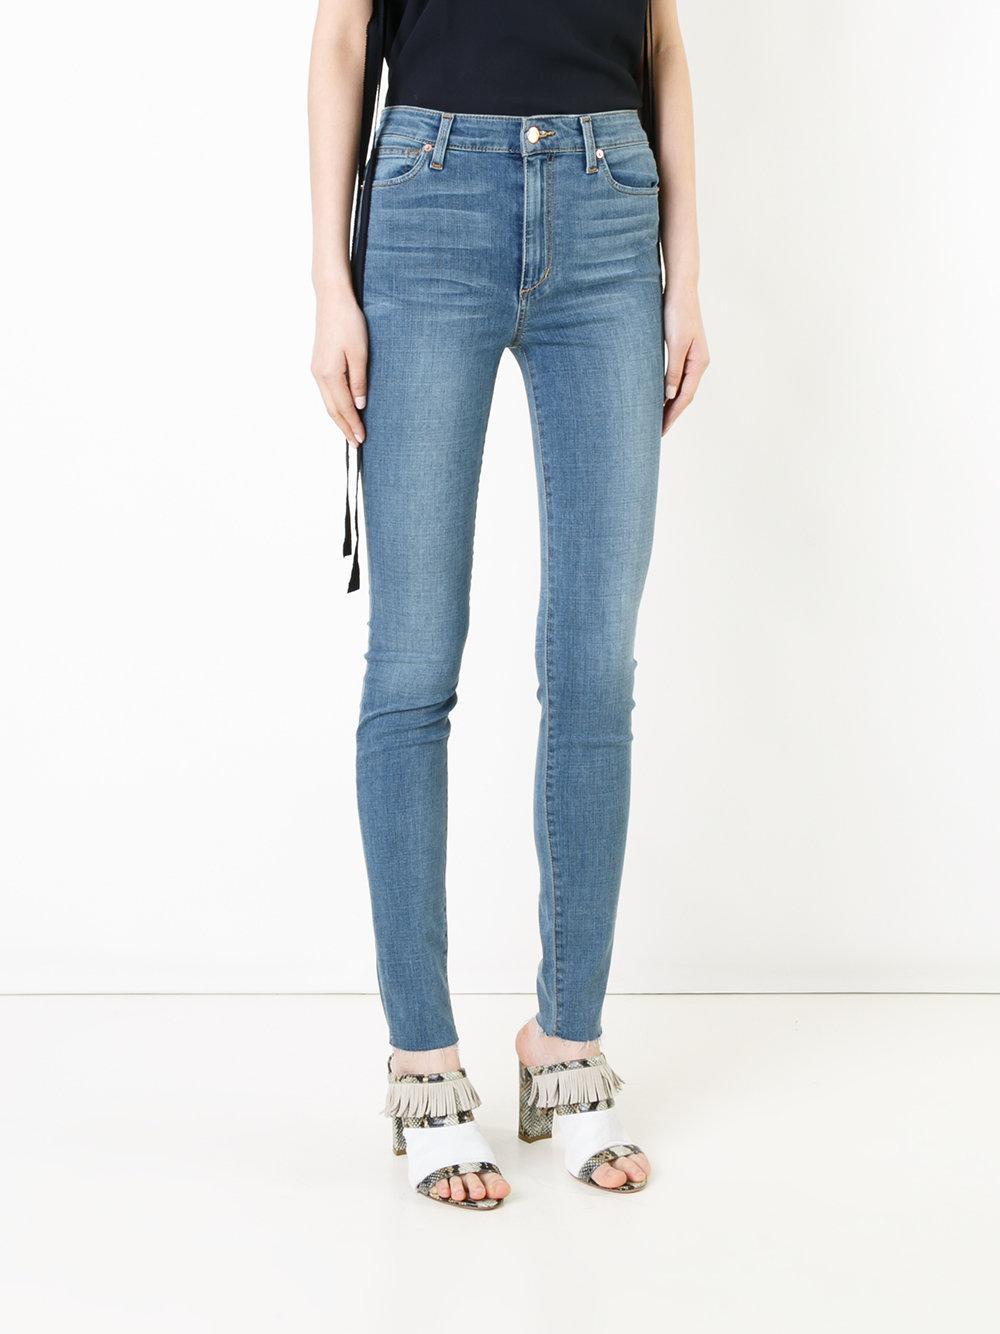 Joe's Jeans Denim Stonewashed Skinny Jeans in Blue